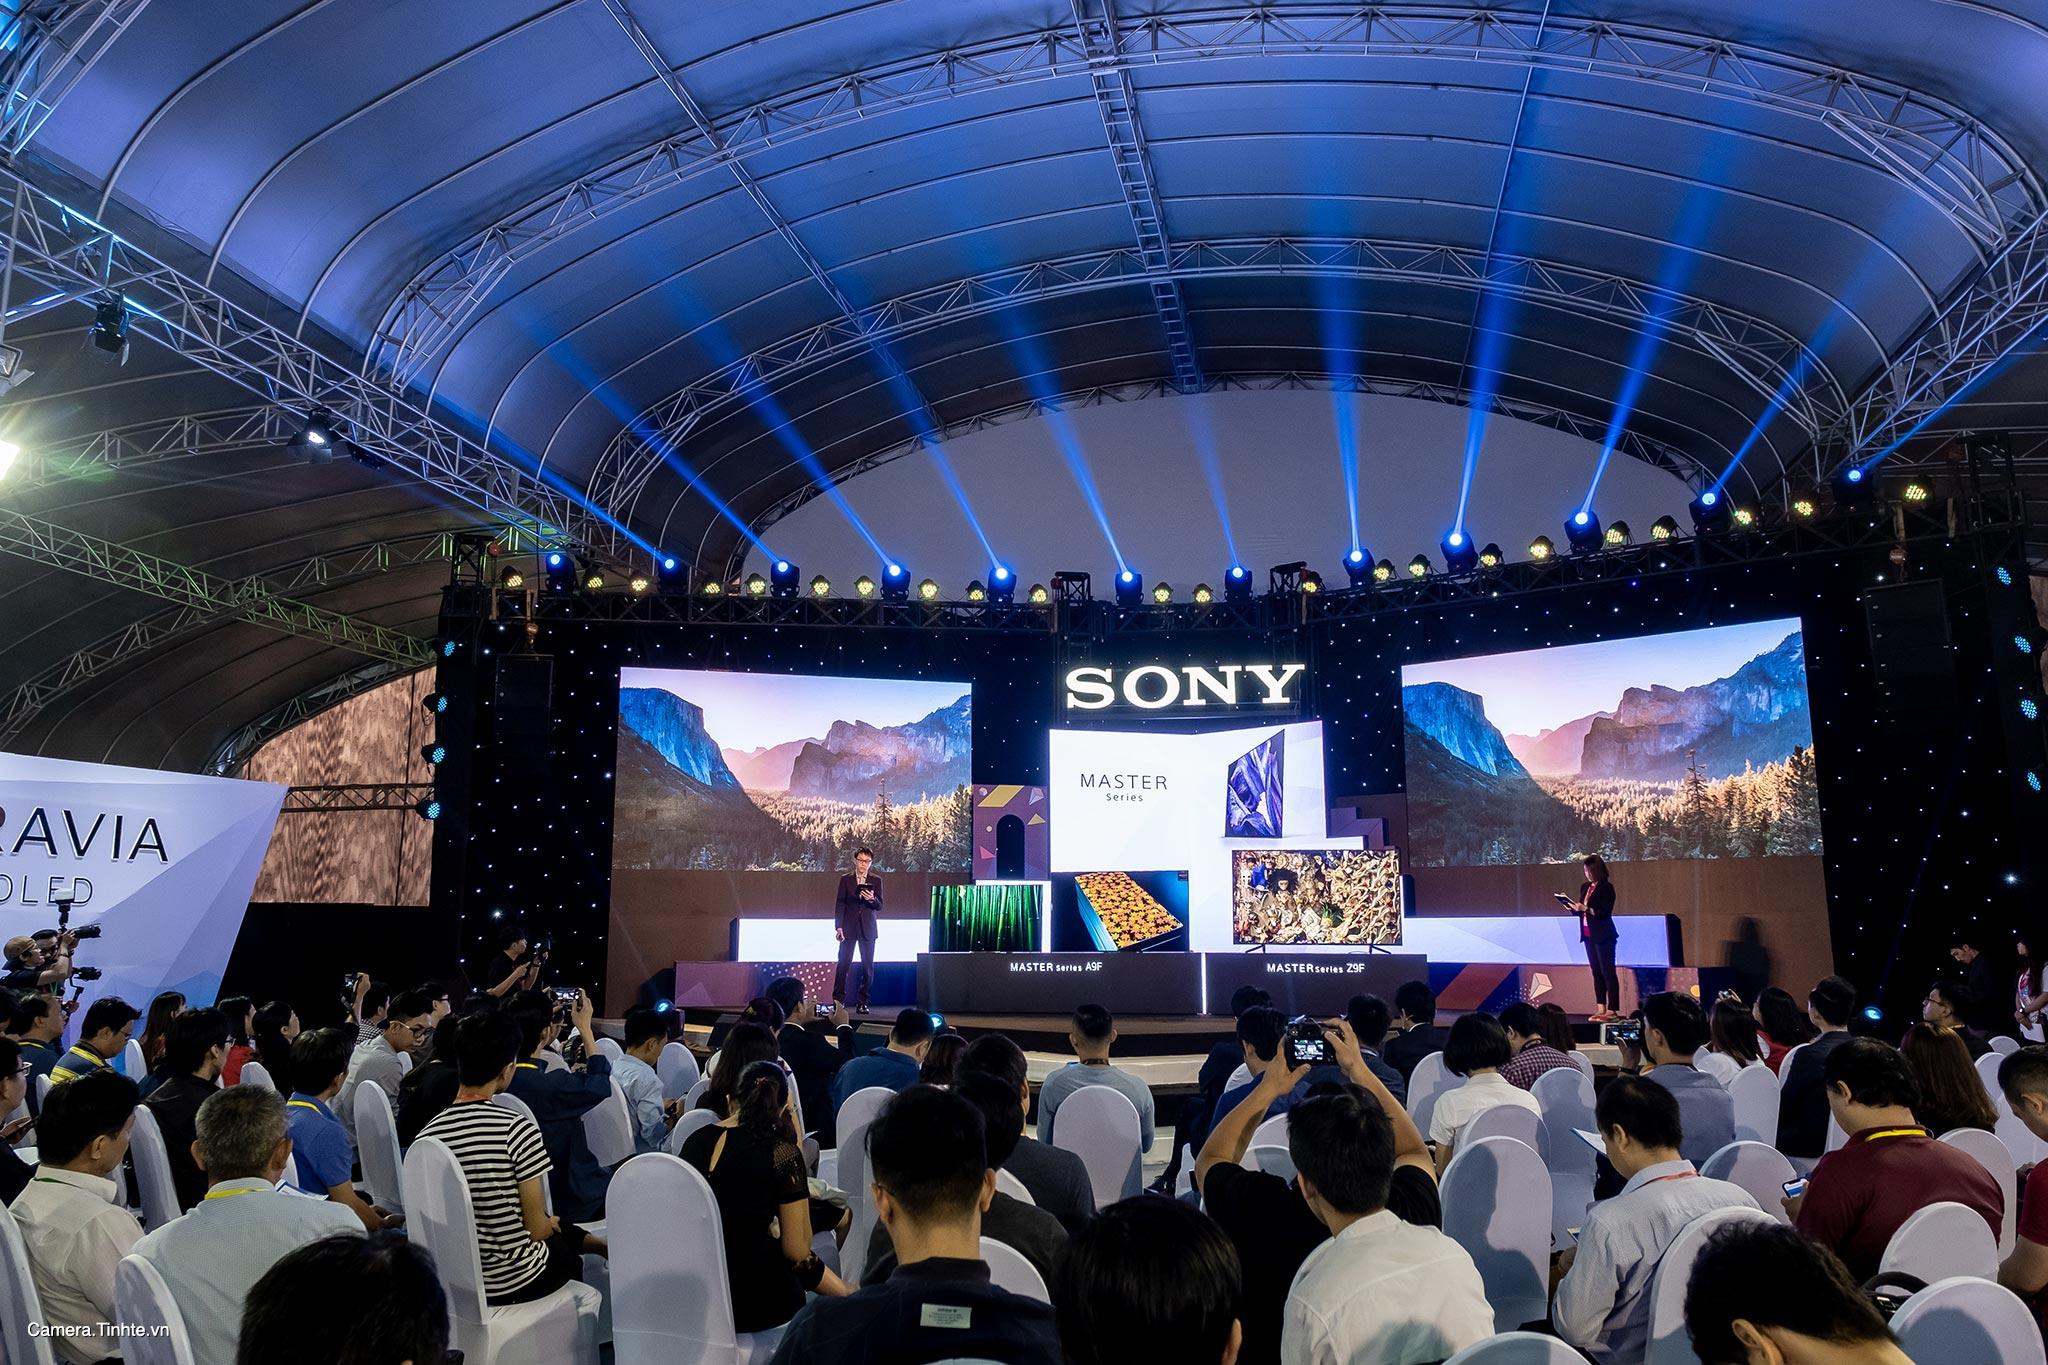 CameraTinhTe_Sony-Show-2018_DSCF0002.jpg